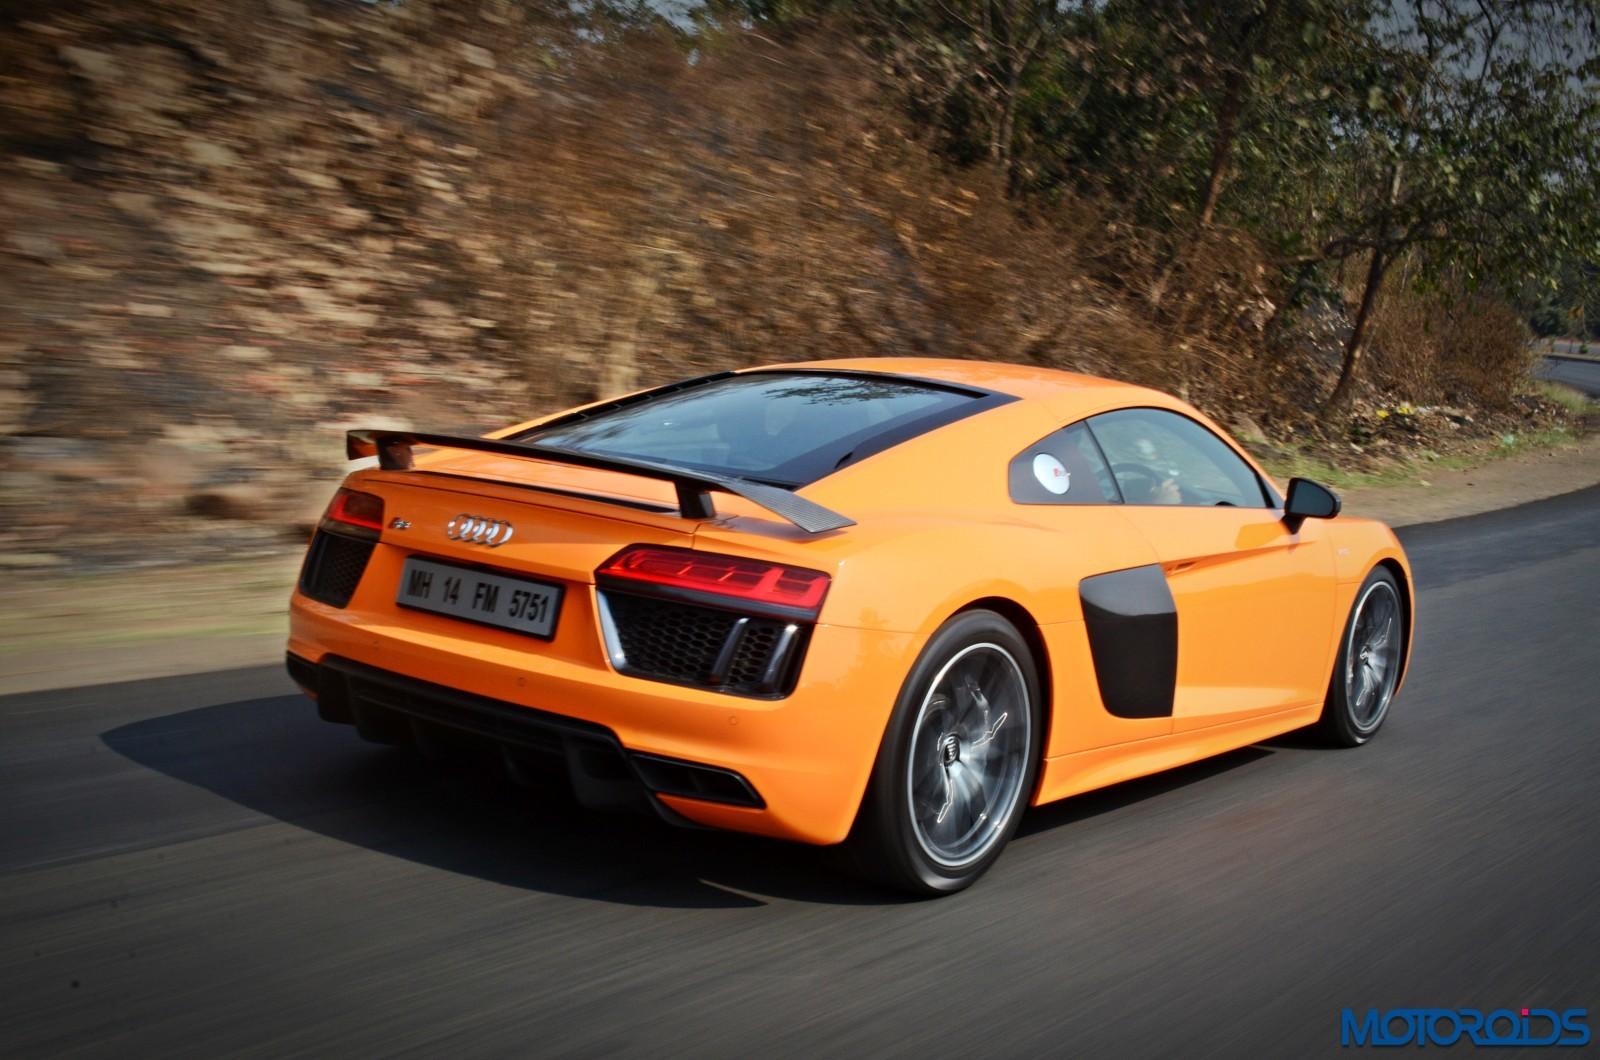 New-Audi-R8-V10-Plus-rear-action-2